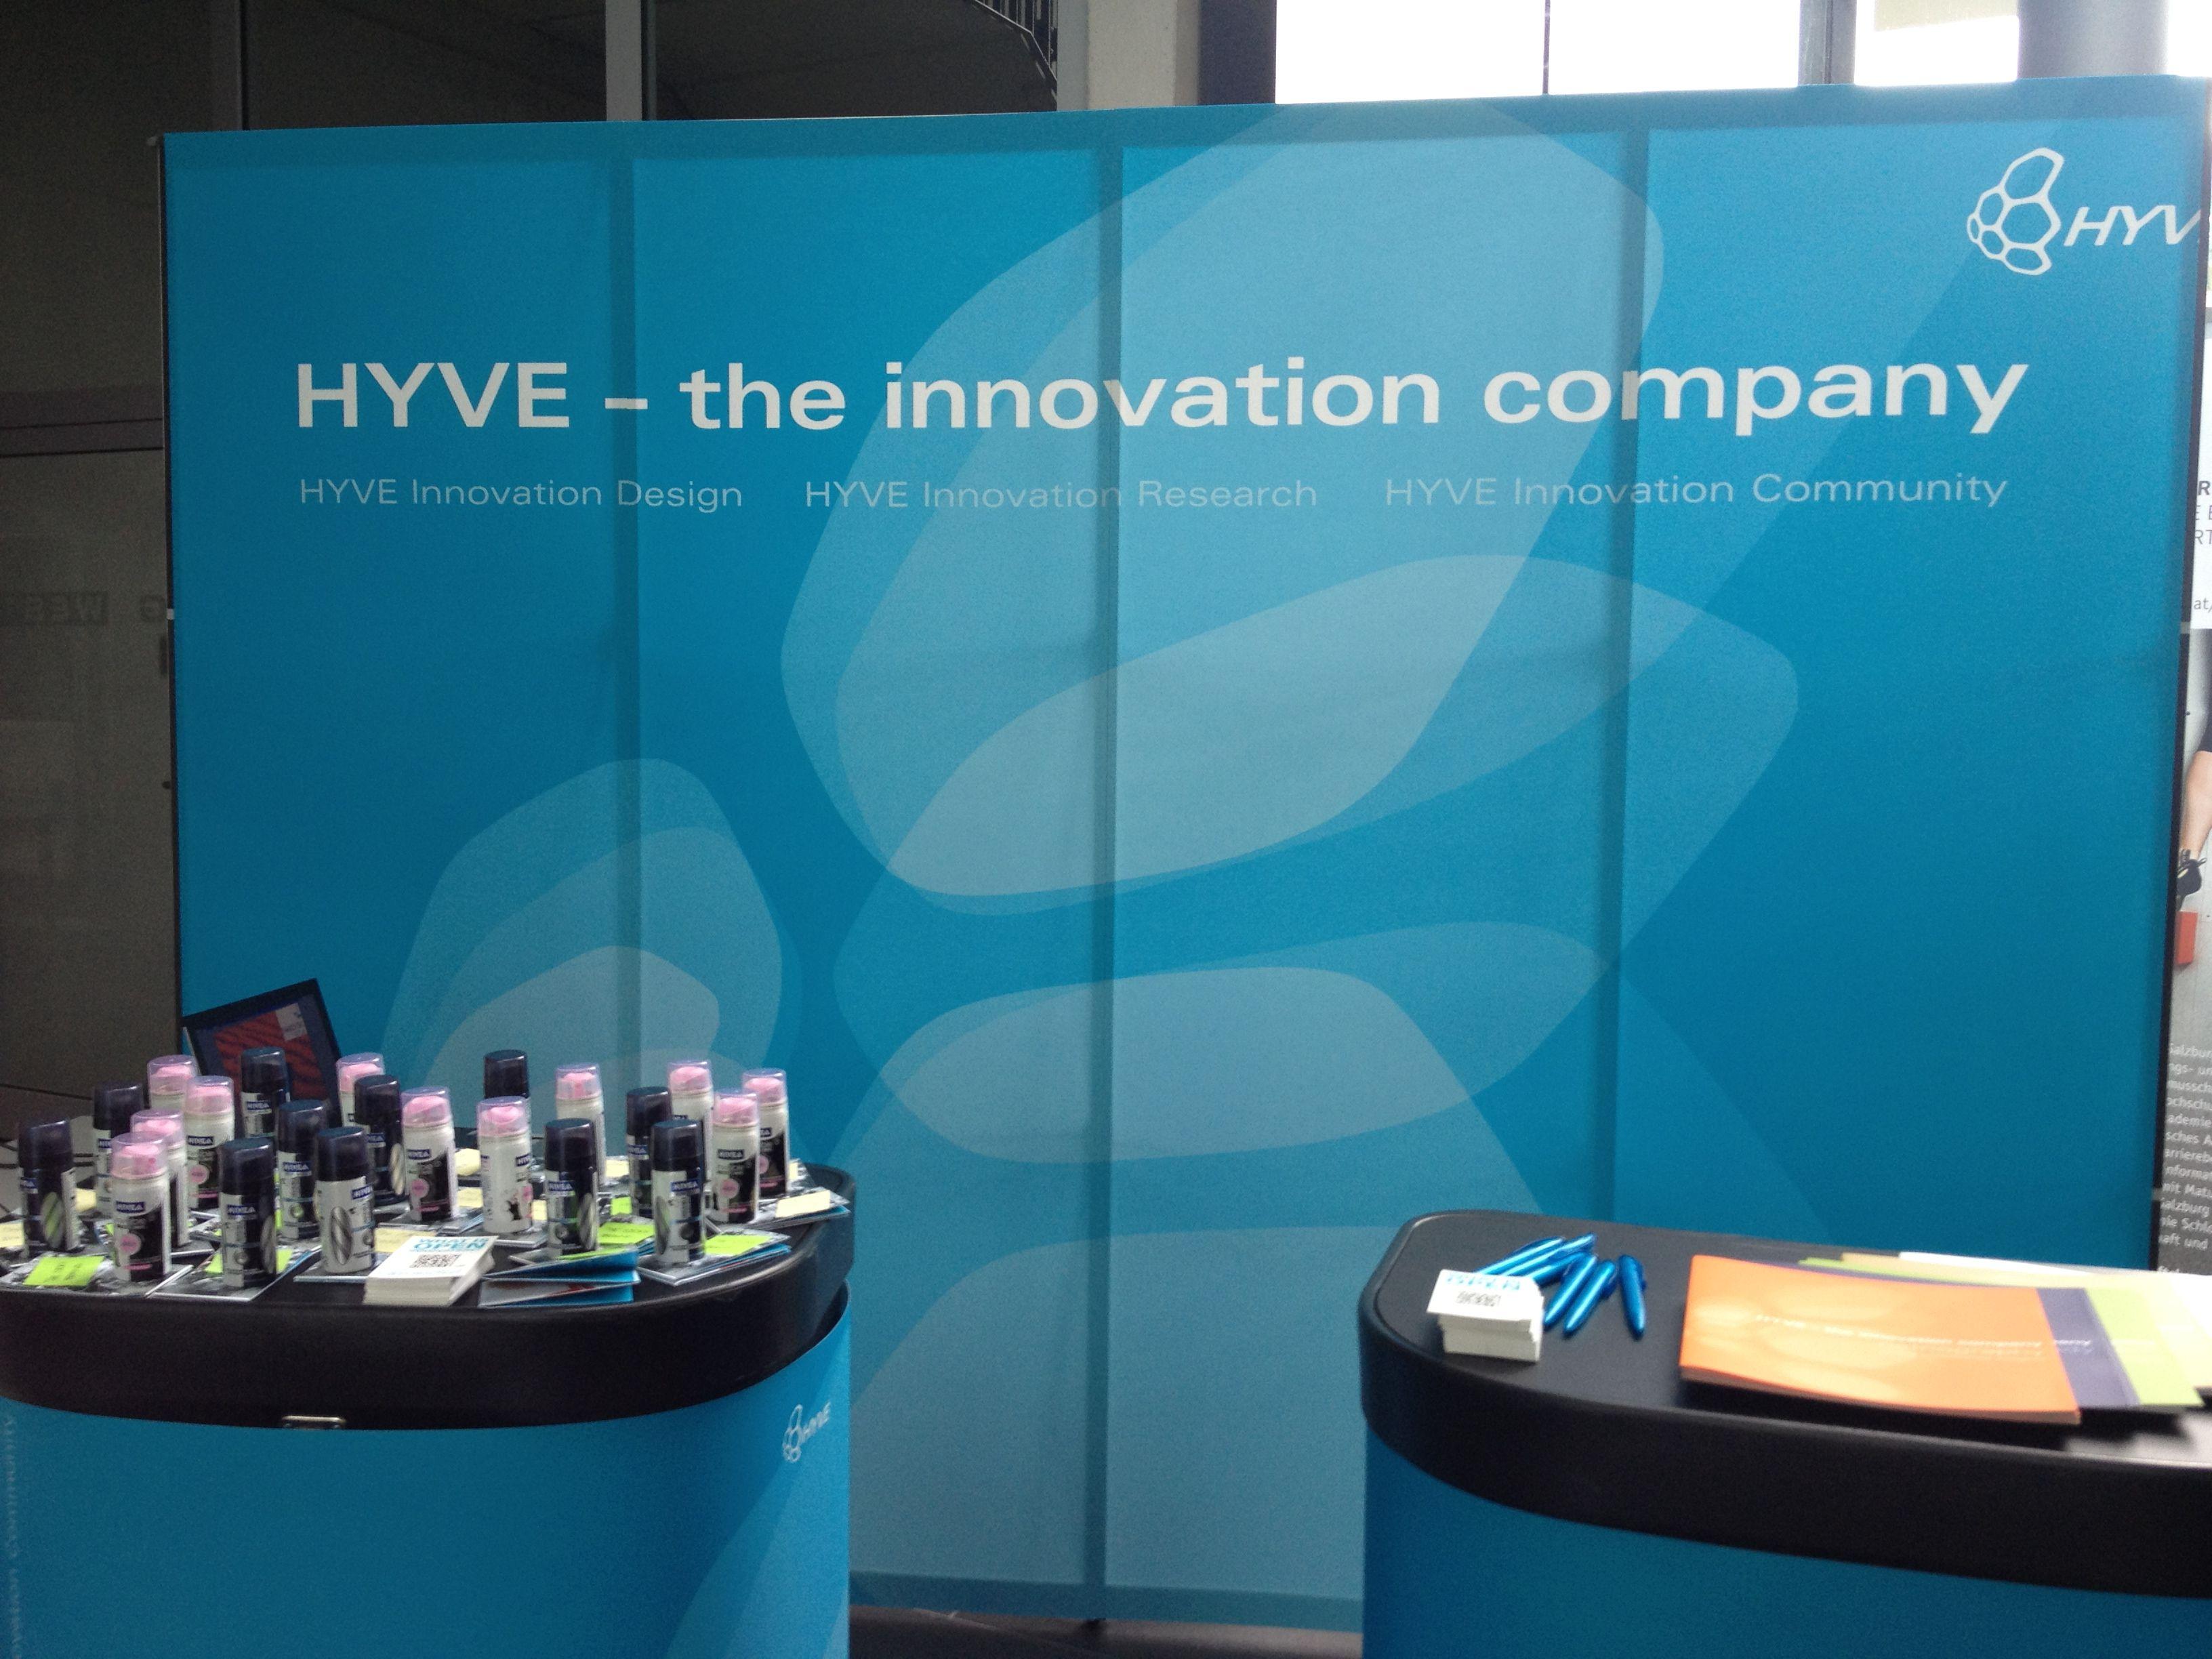 Hyve exhibition stand MC 2012 Innovation design